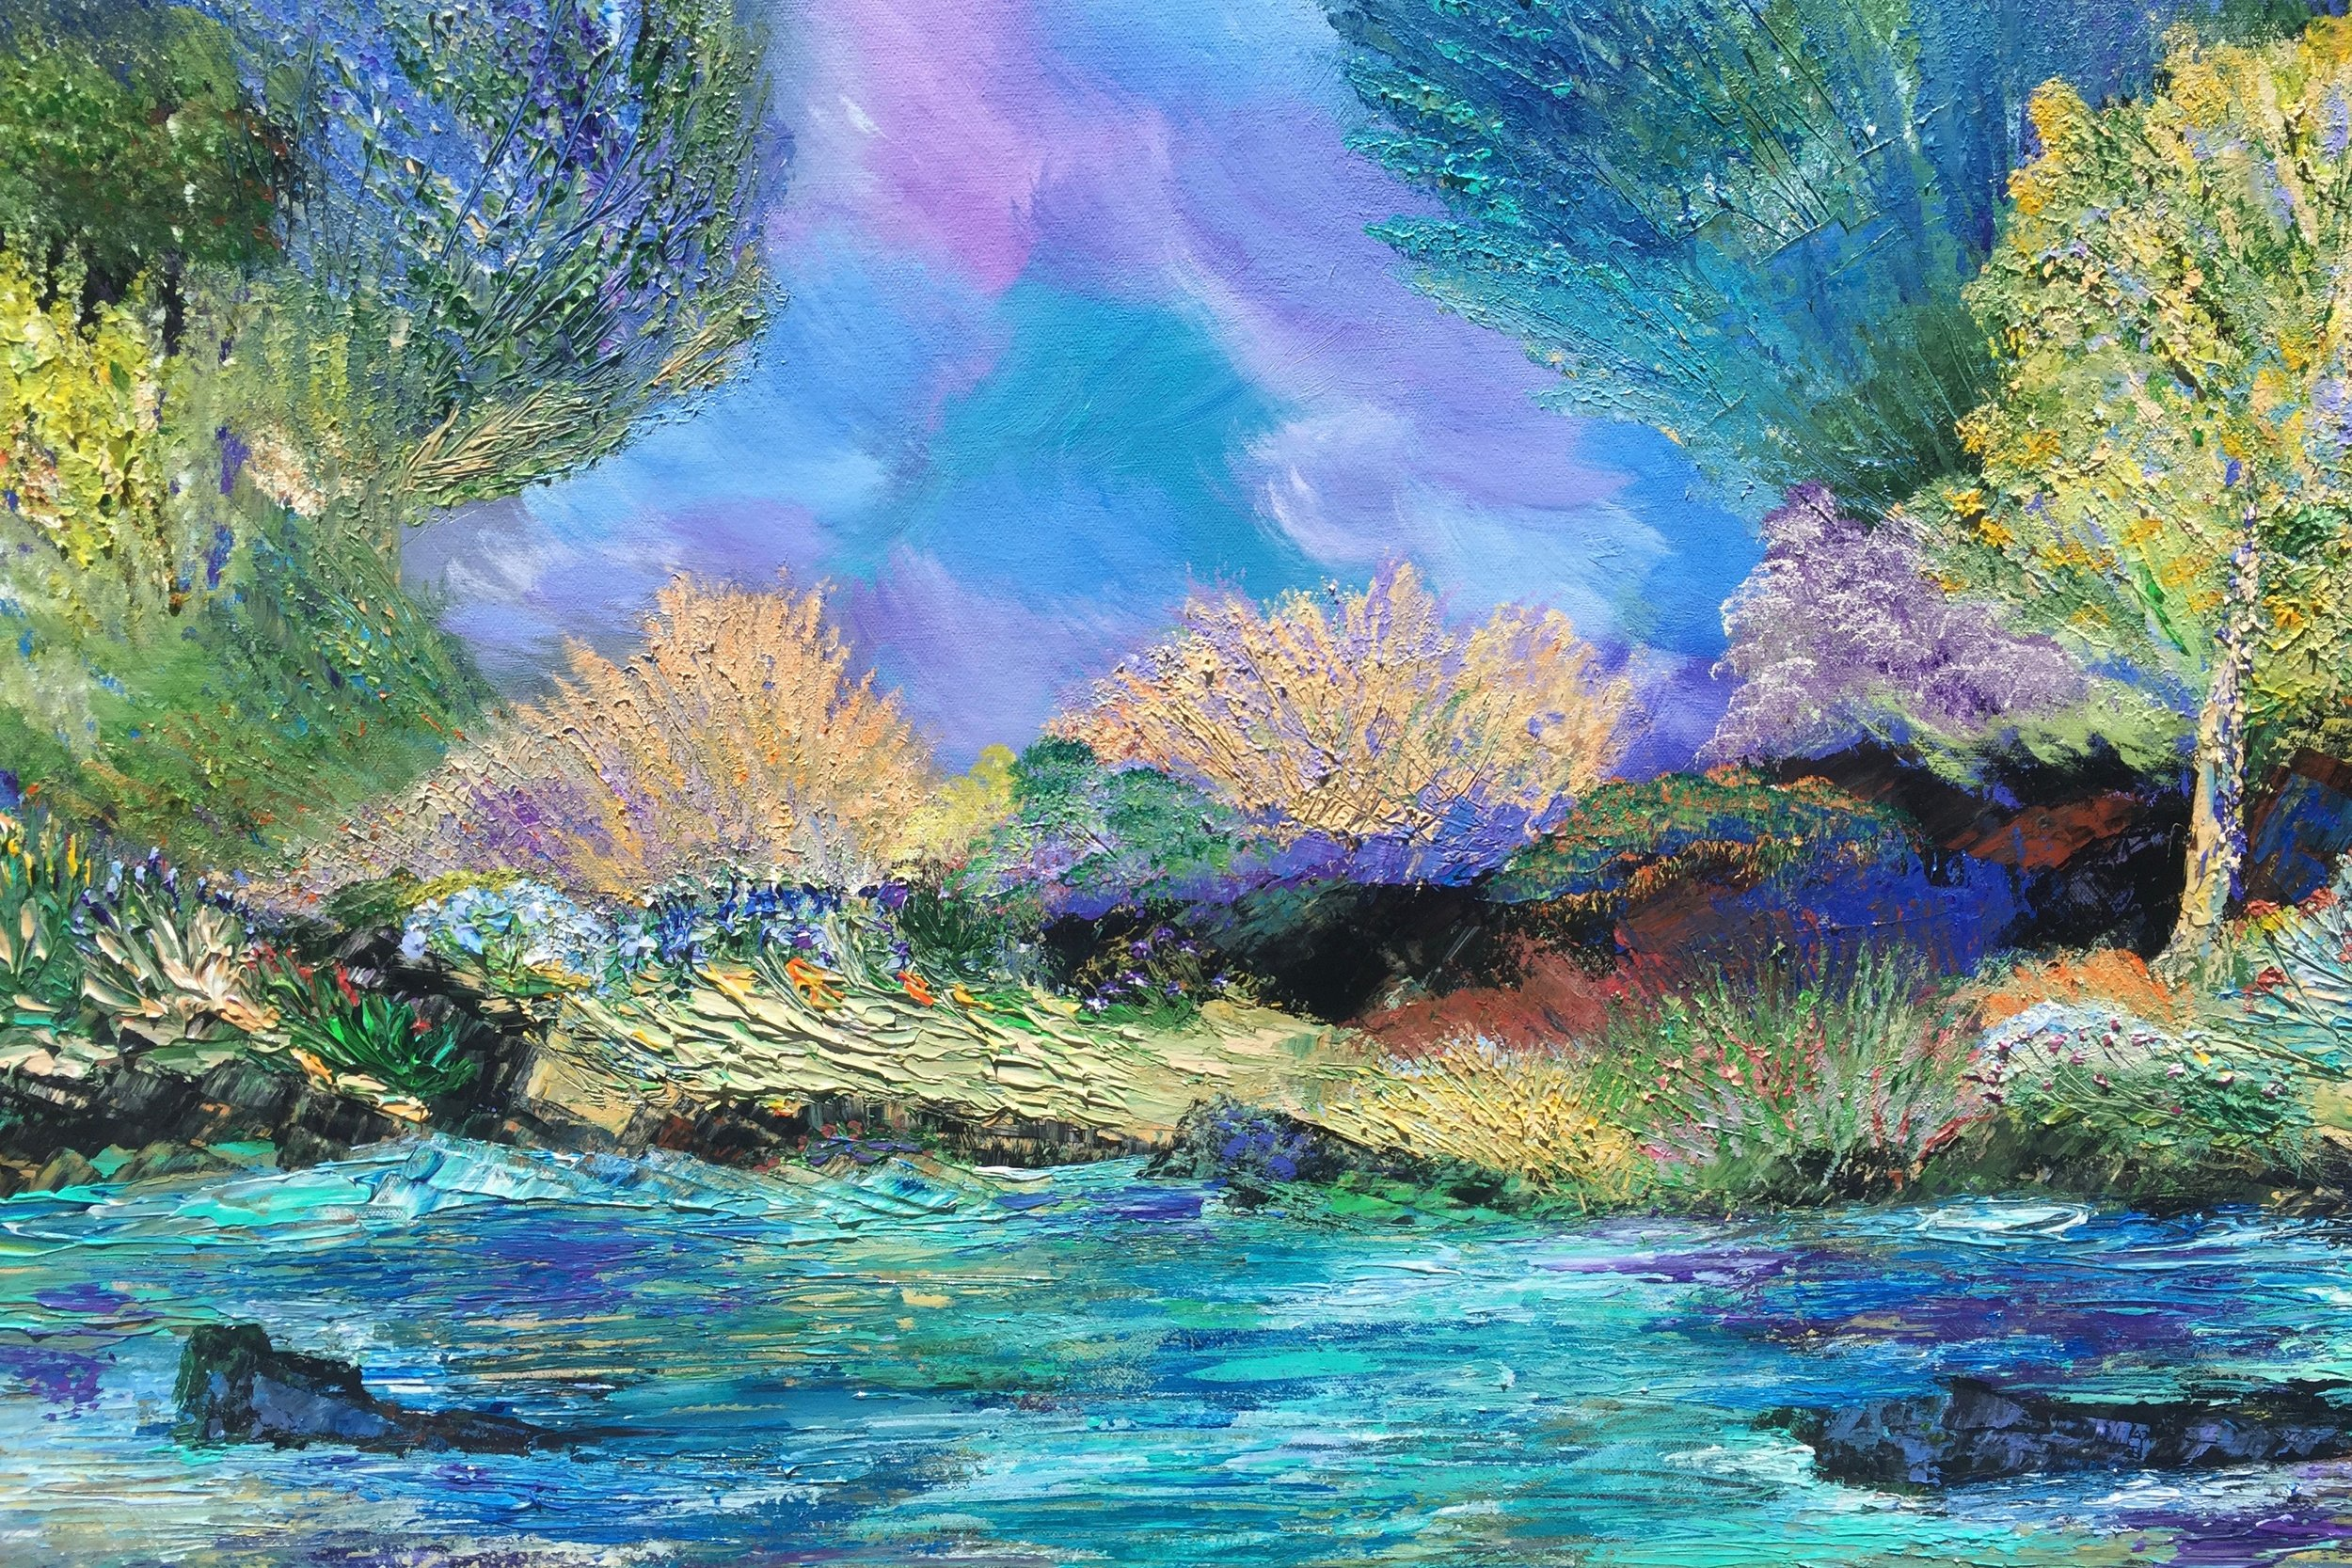 Cathy's Pond